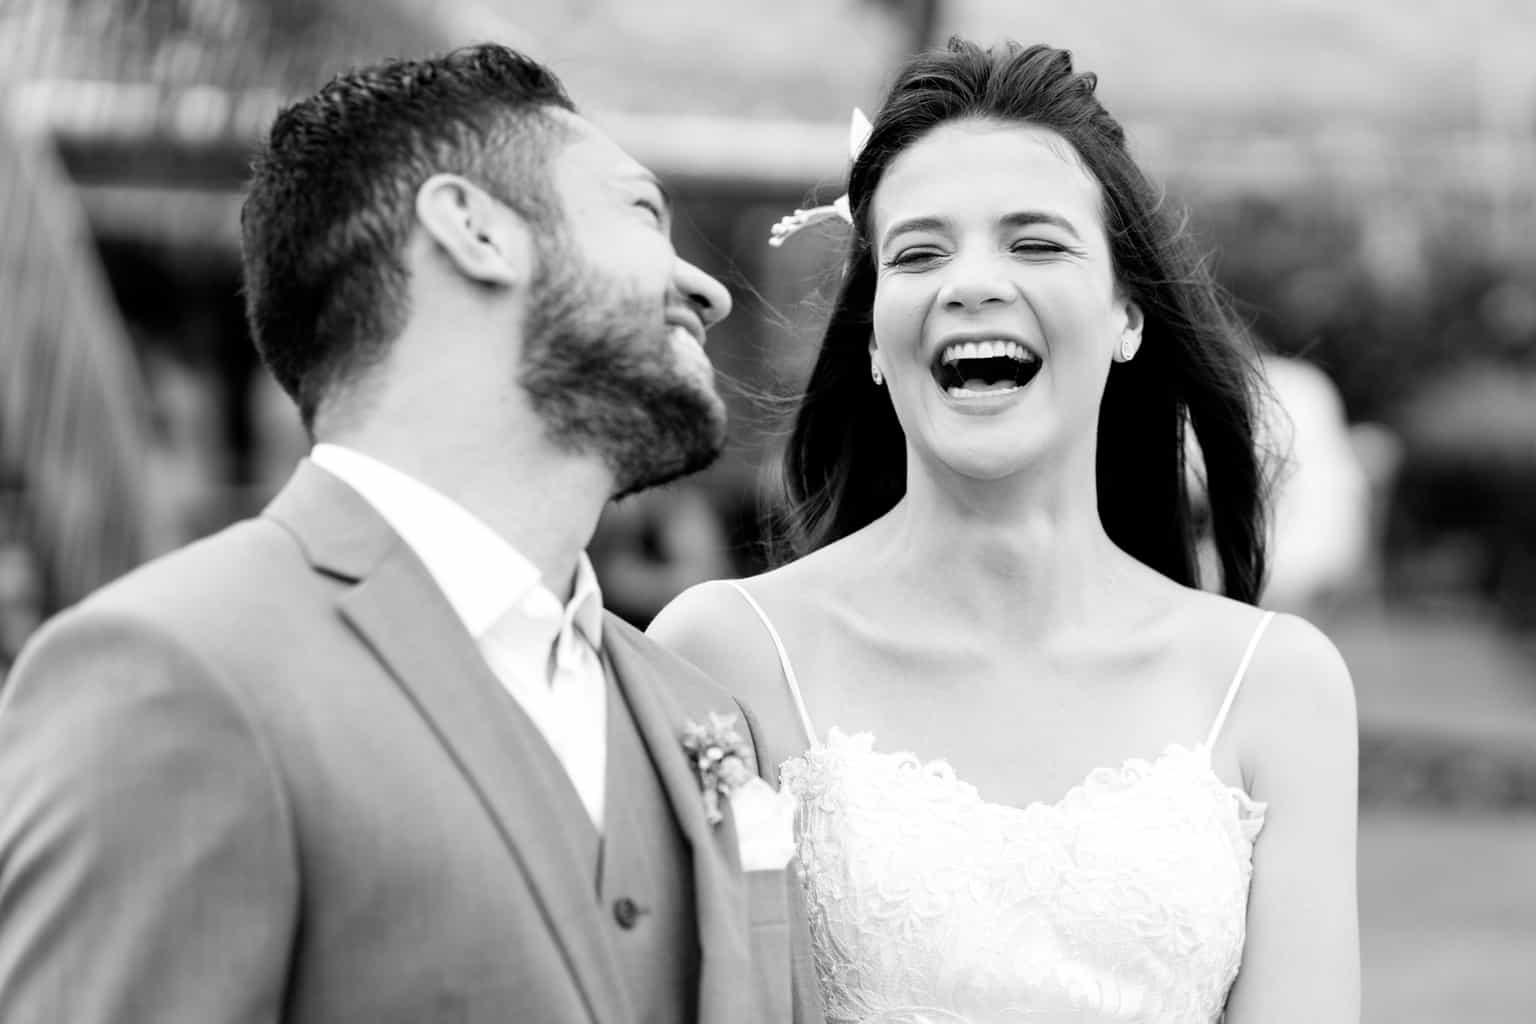 Casamento-Emanuelle-e-Alysson-Fotografia-Tadeu-Nanó-e-Luca-Antunes85-1